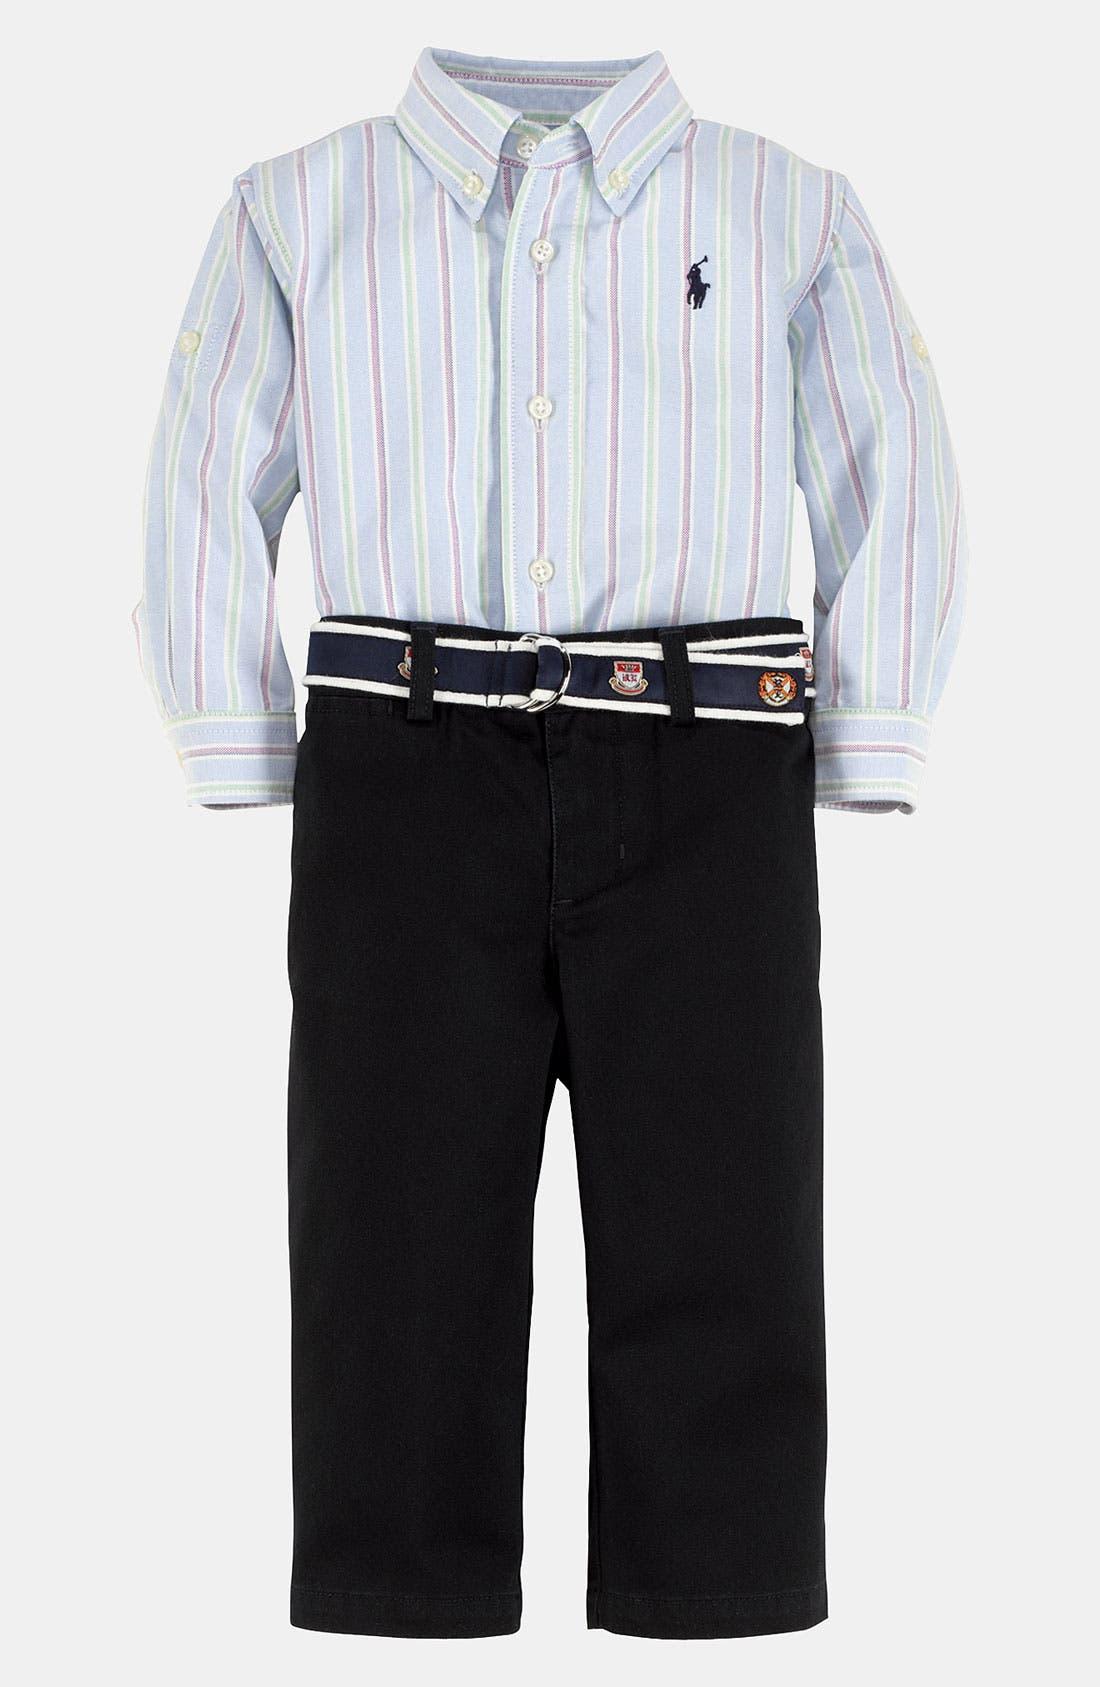 Alternate Image 1 Selected - Ralph Lauren Stripe Shirt & Pants (Infant)